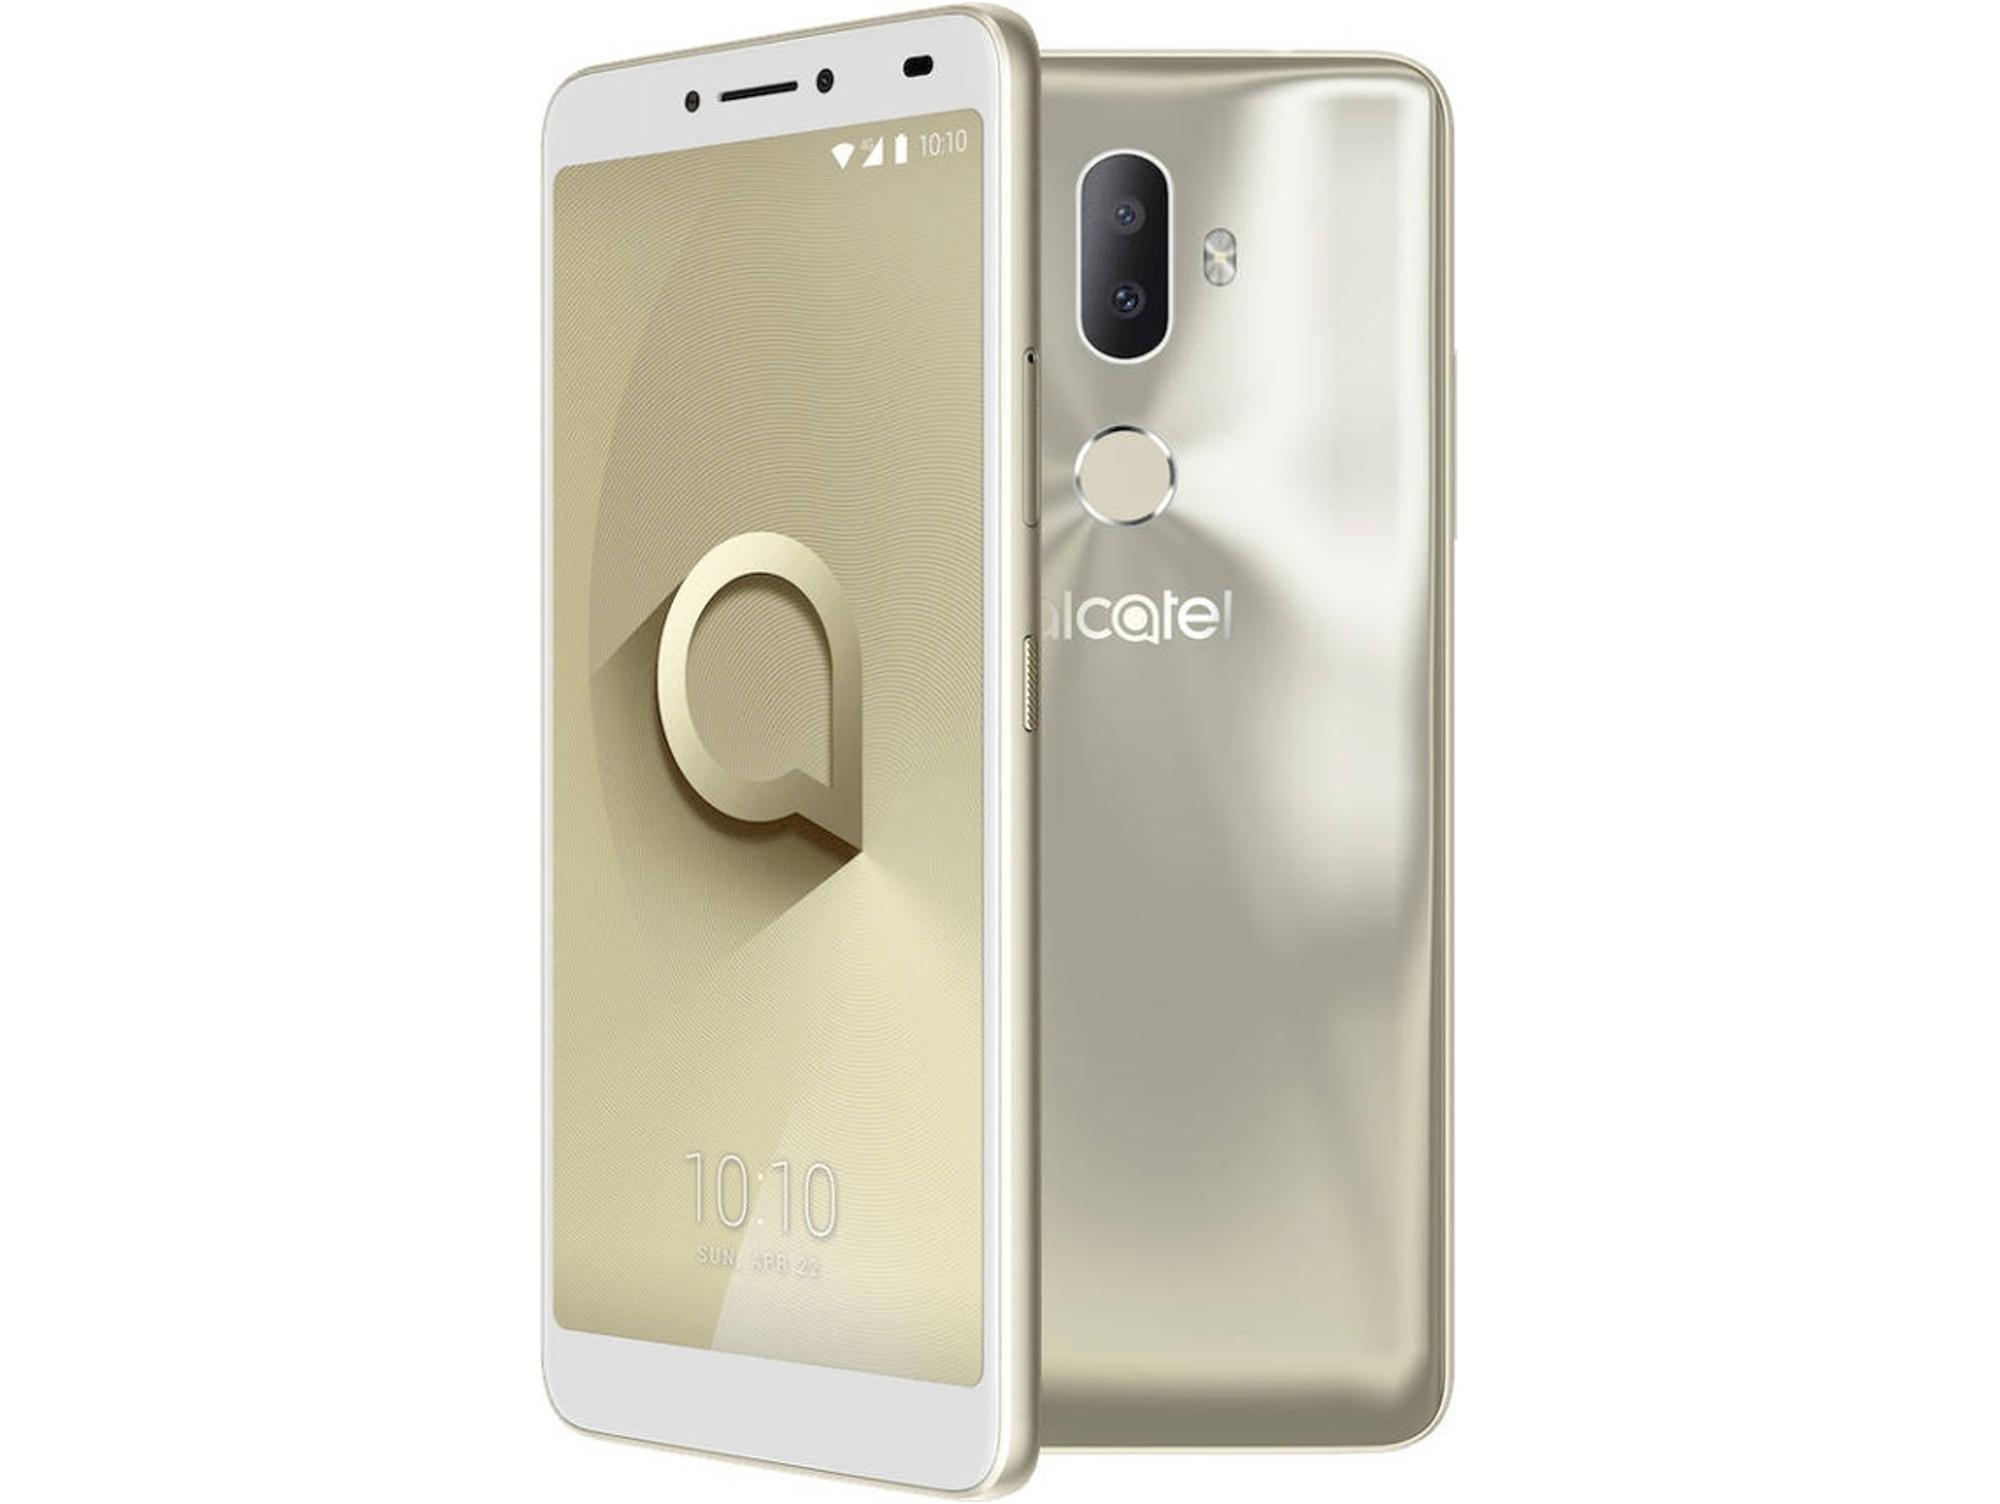 648e8bdddce Smartphone ALCATEL 3V (6'' - 2 GB - 16 GB - Dorado) - WORTEN